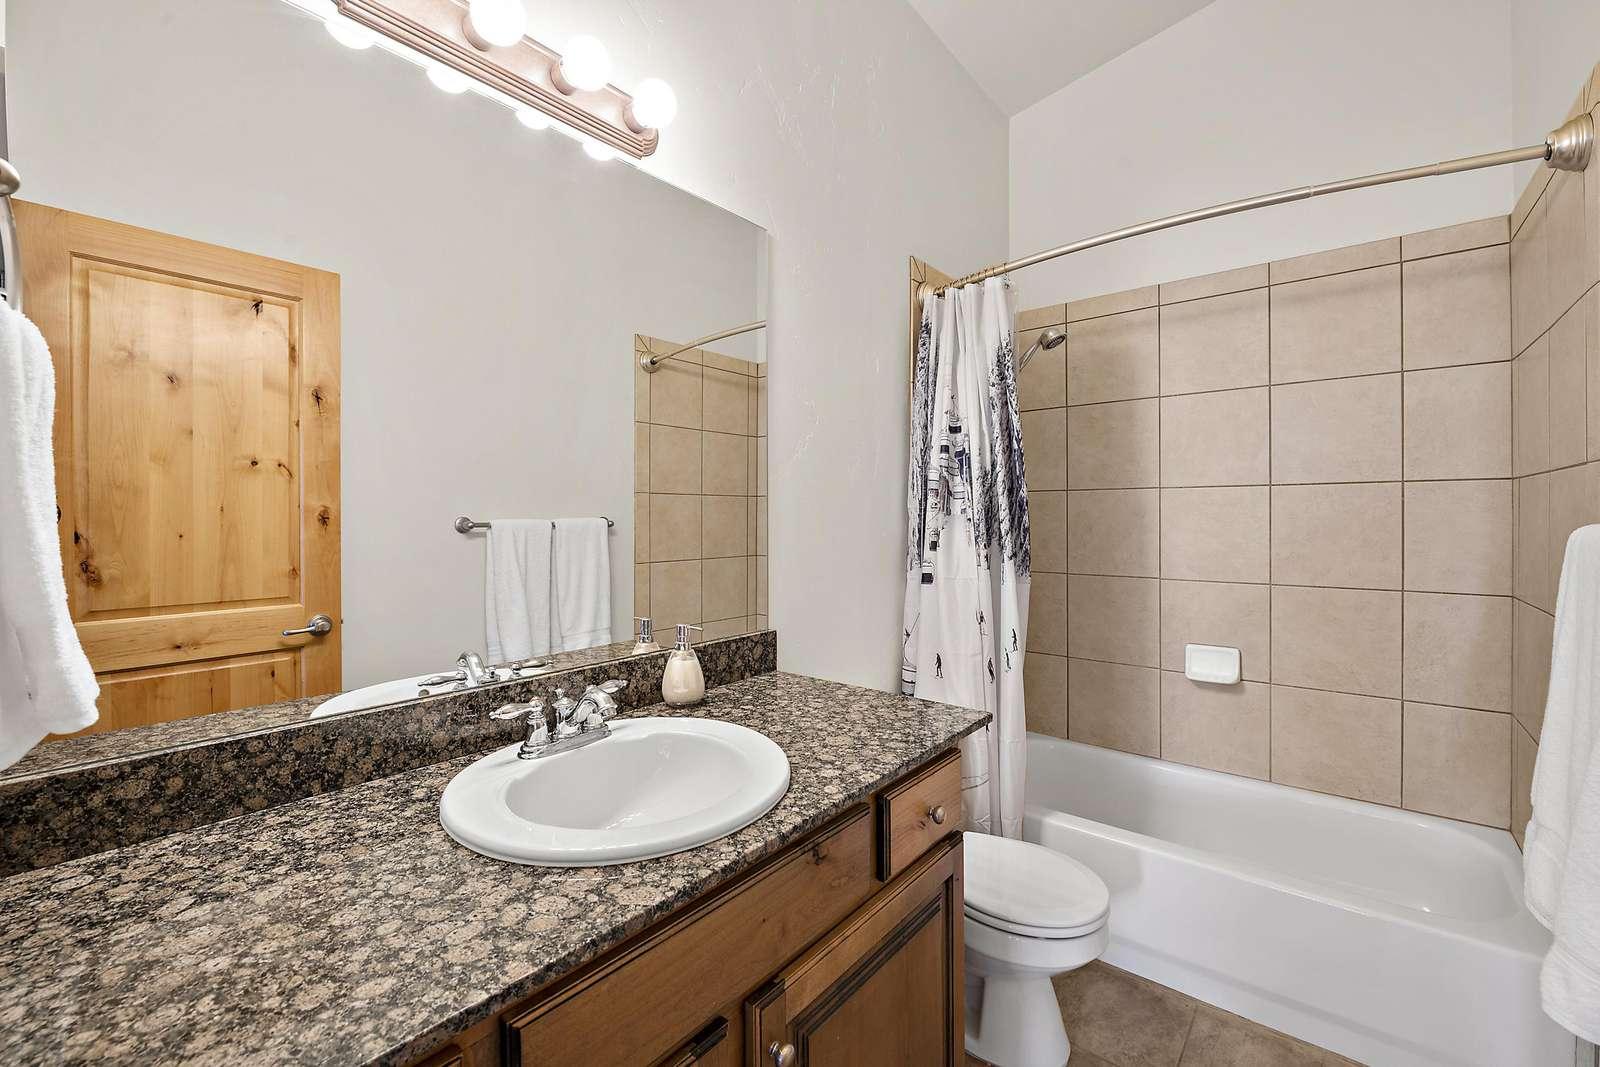 Additional guest bathroom with a tub/shower